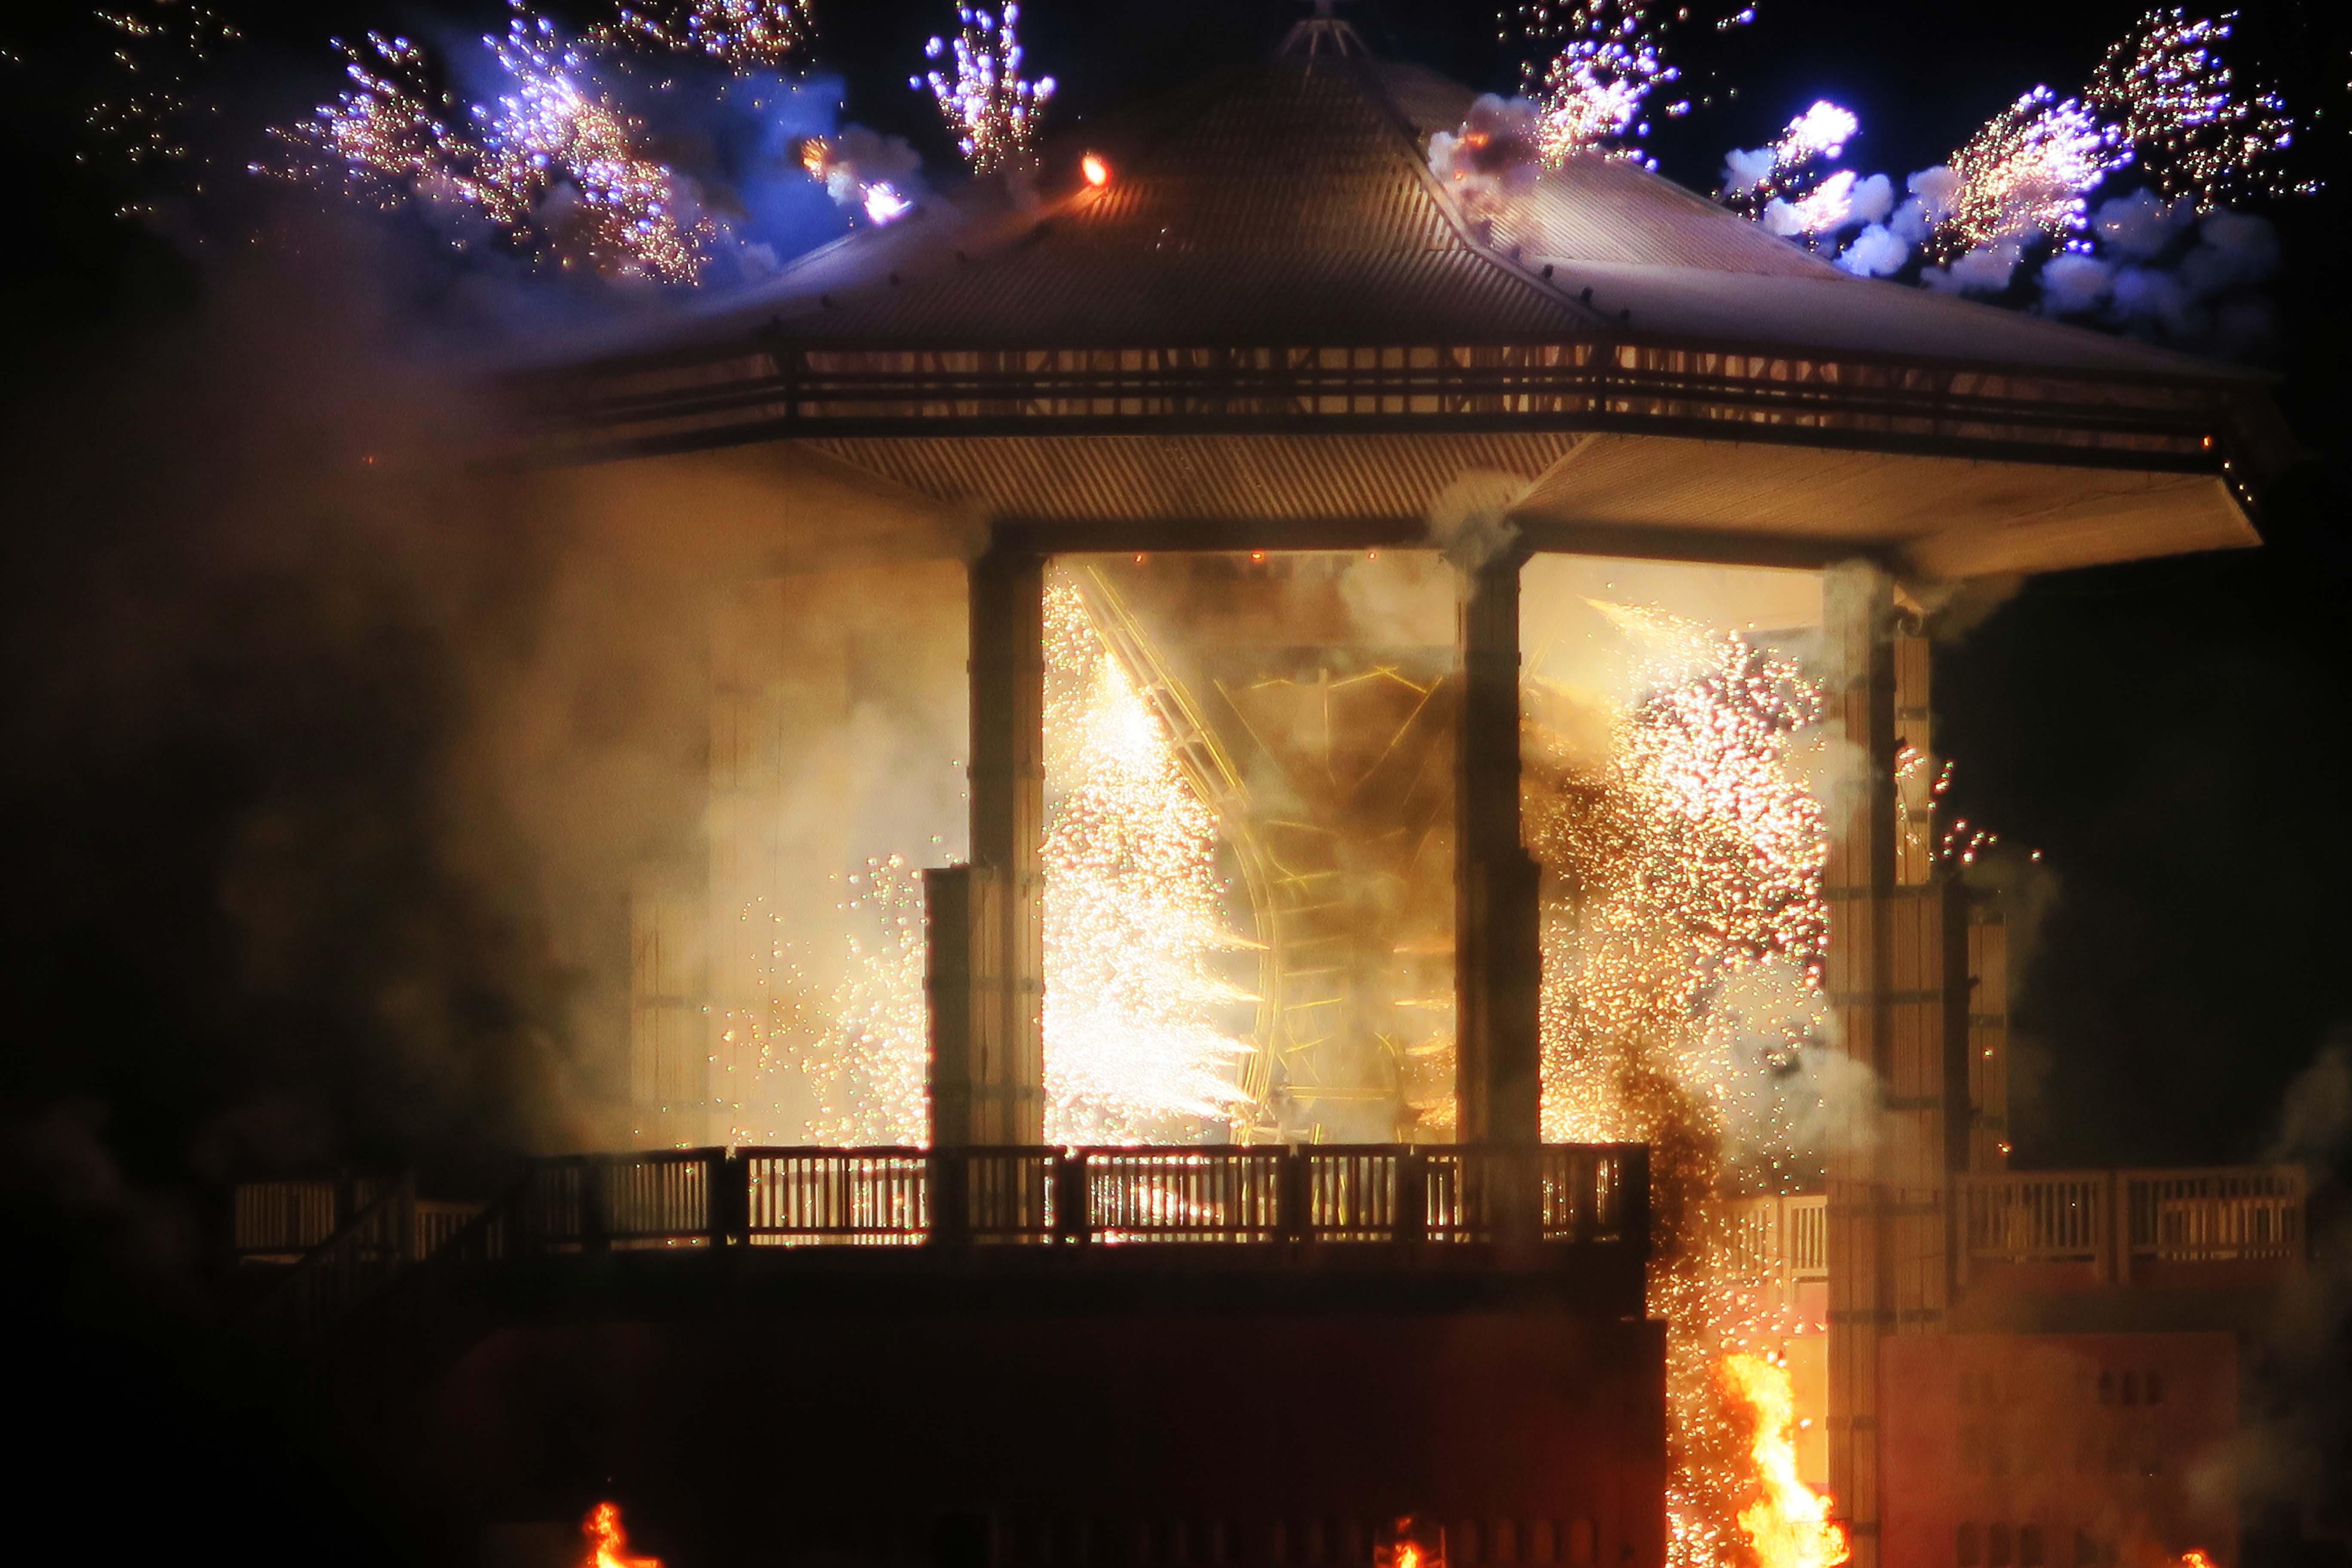 Man shoots out fireworks at Burning Man 2017